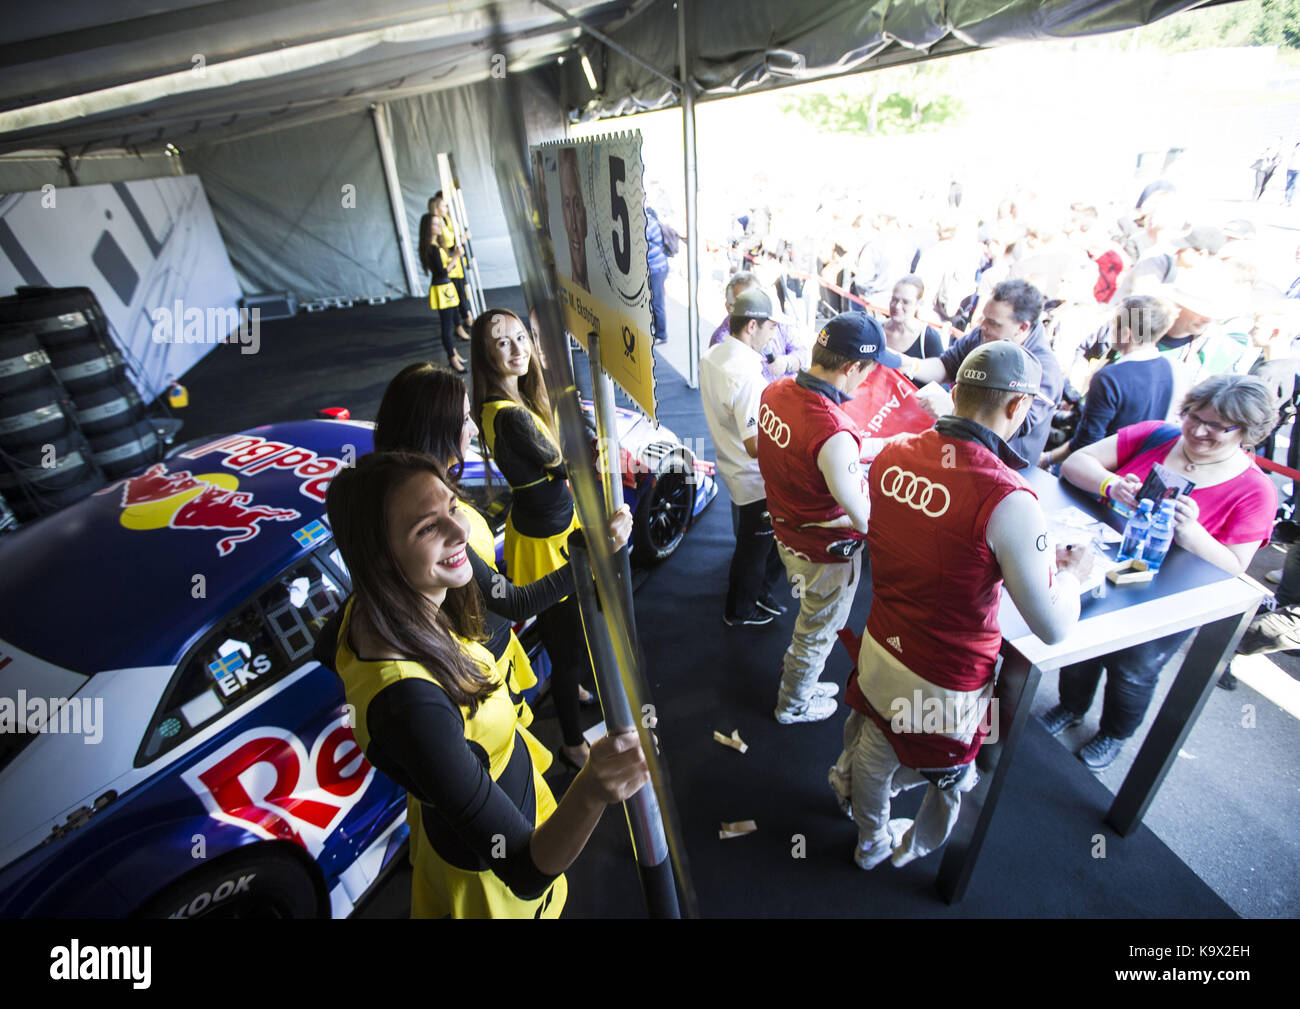 Motorsports: DTM 08 Spielberg 2017, Autogrammstunde - autograph session, Mattias Ekström, Nico Müller | Verwendung Stock Photo